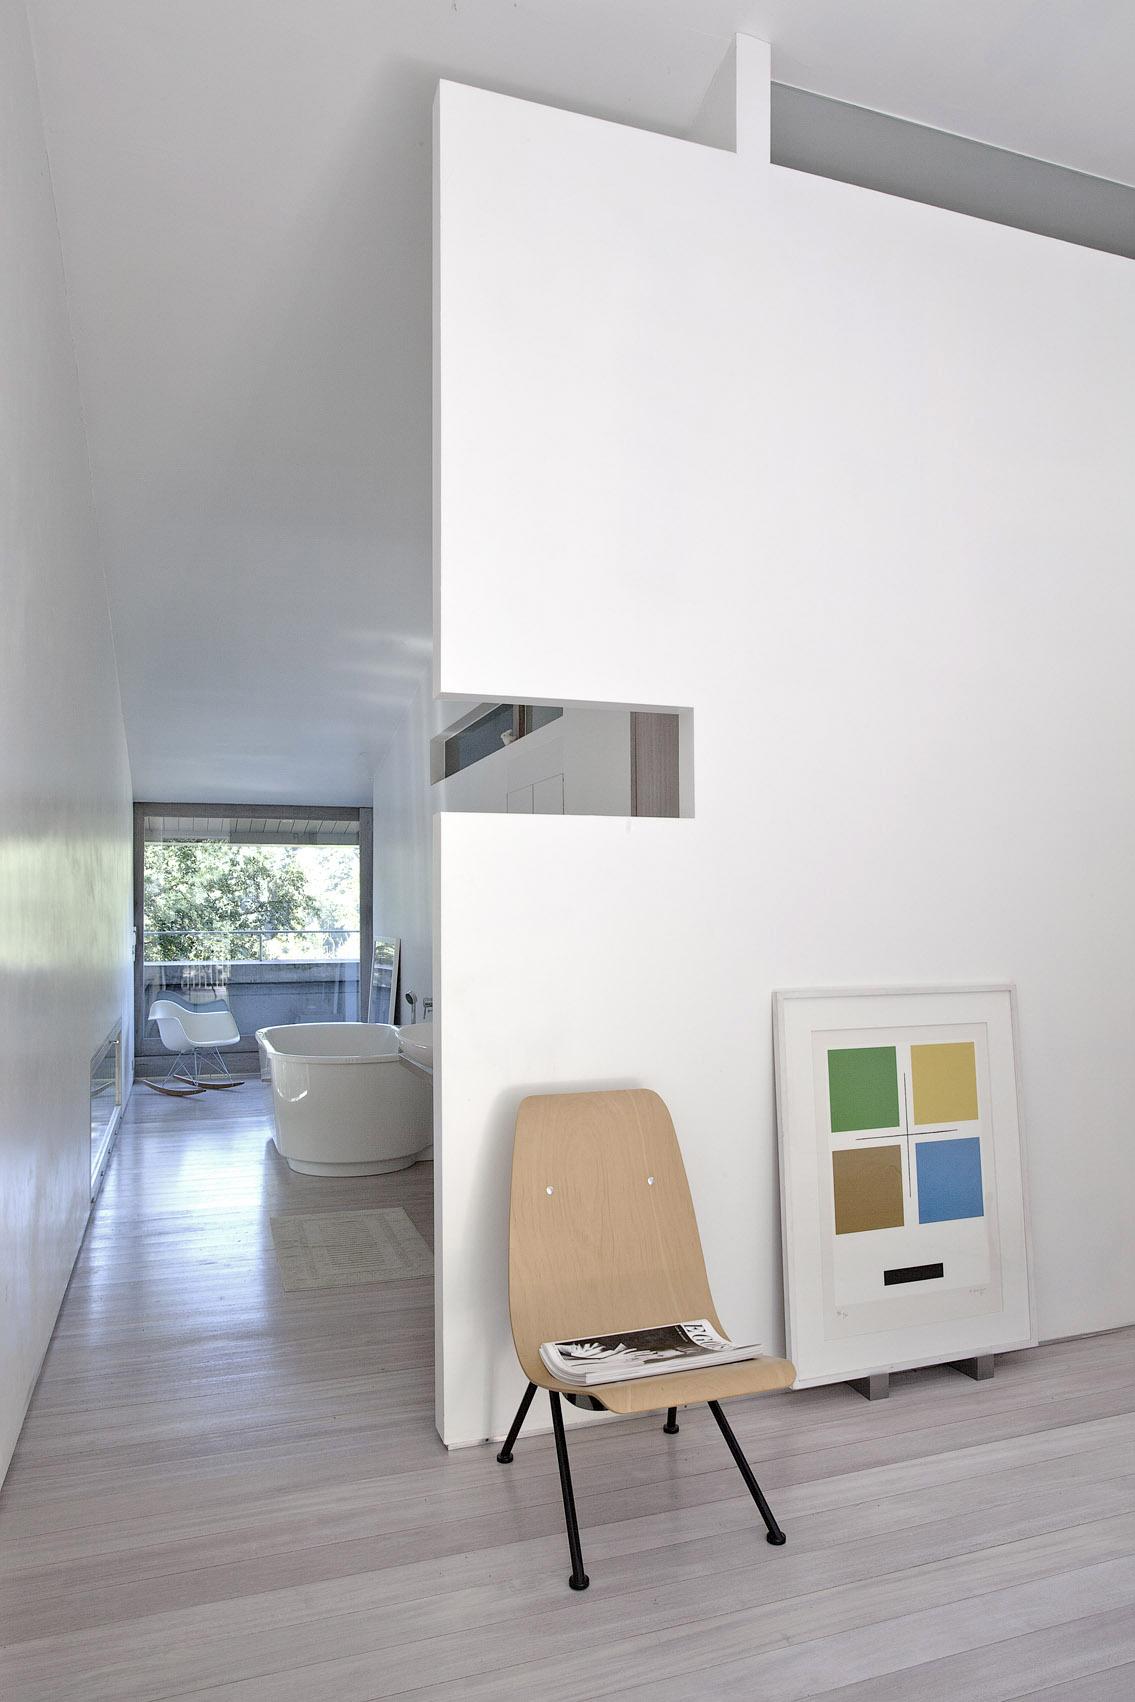 architecte_bruno_albert_serge_delsemme_photo_caroline_dethier_059.jpg